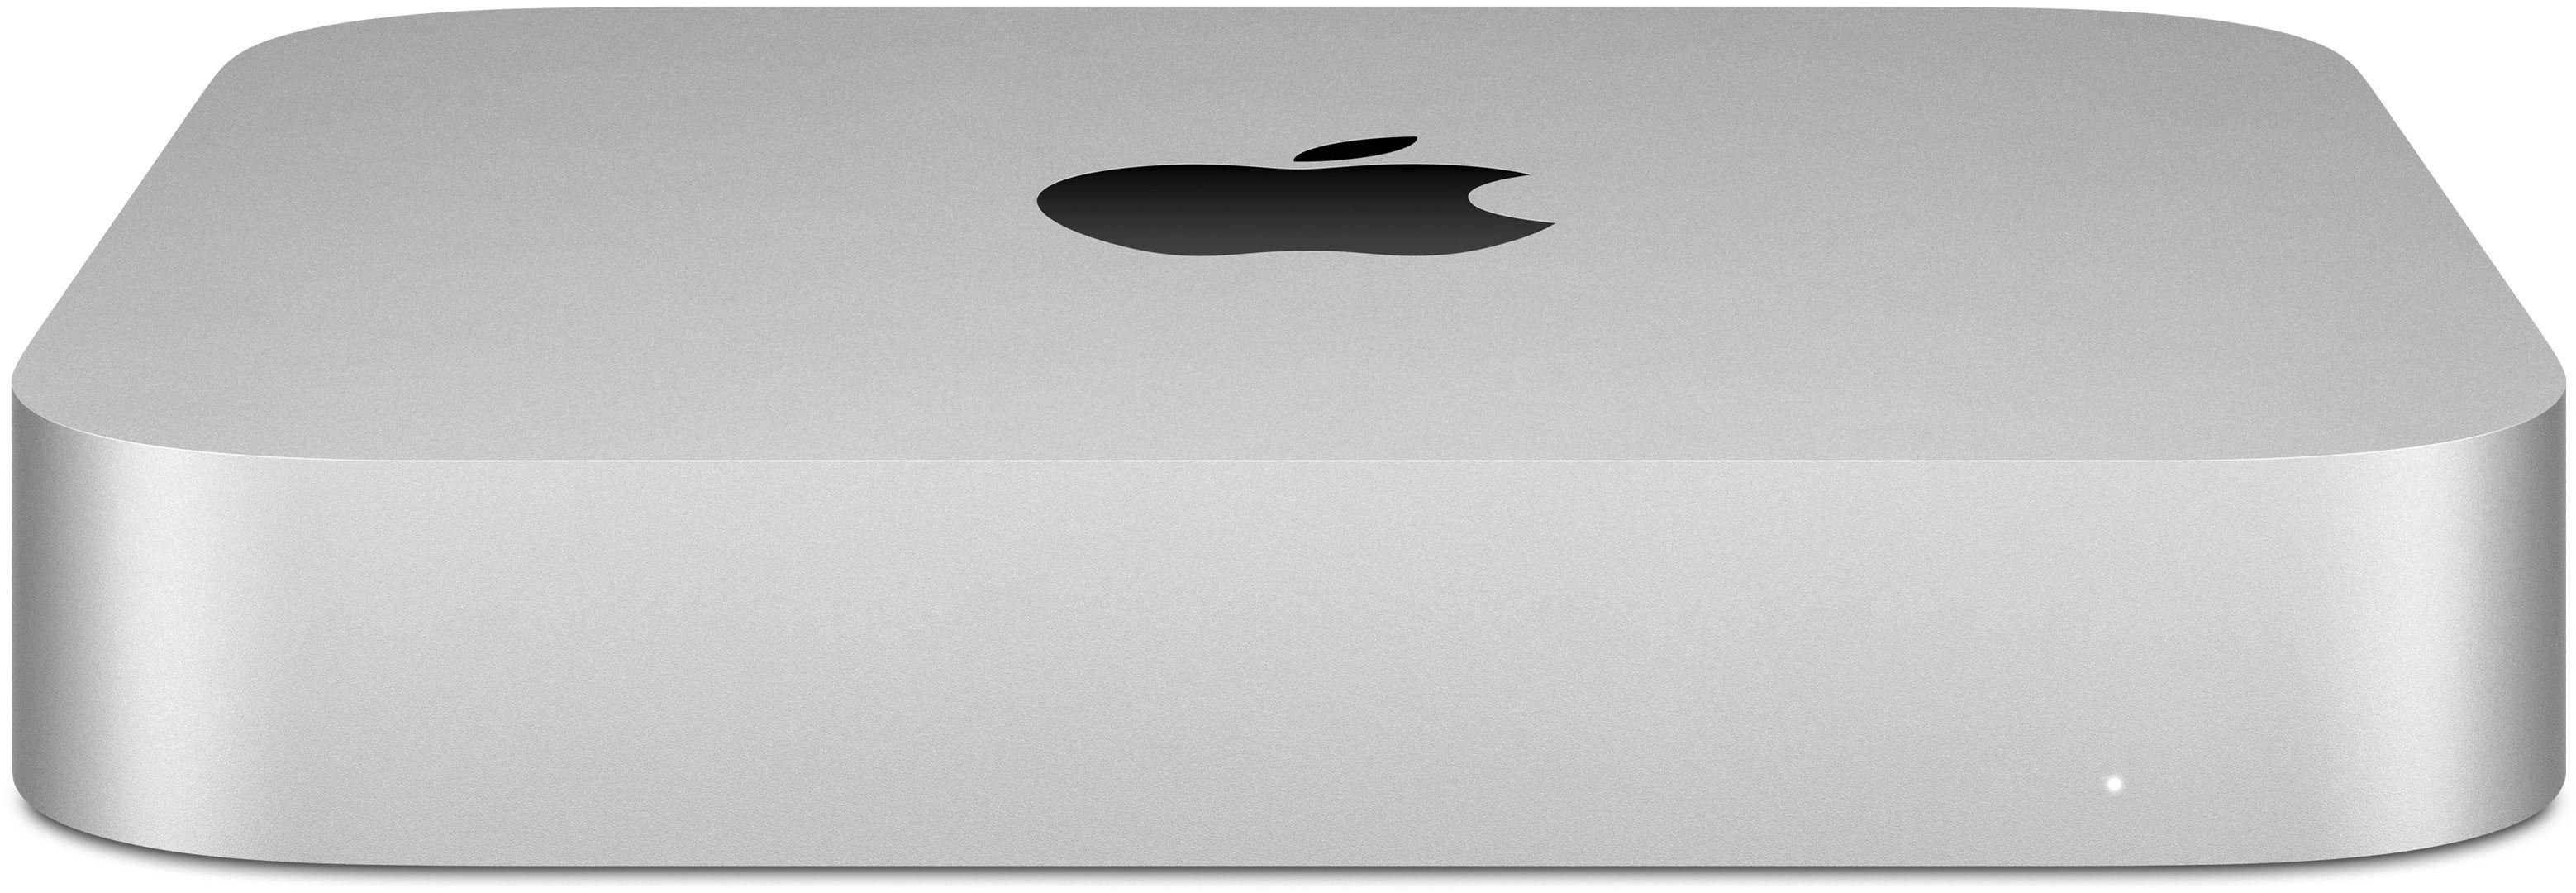 Komputer stacjonarny Apple